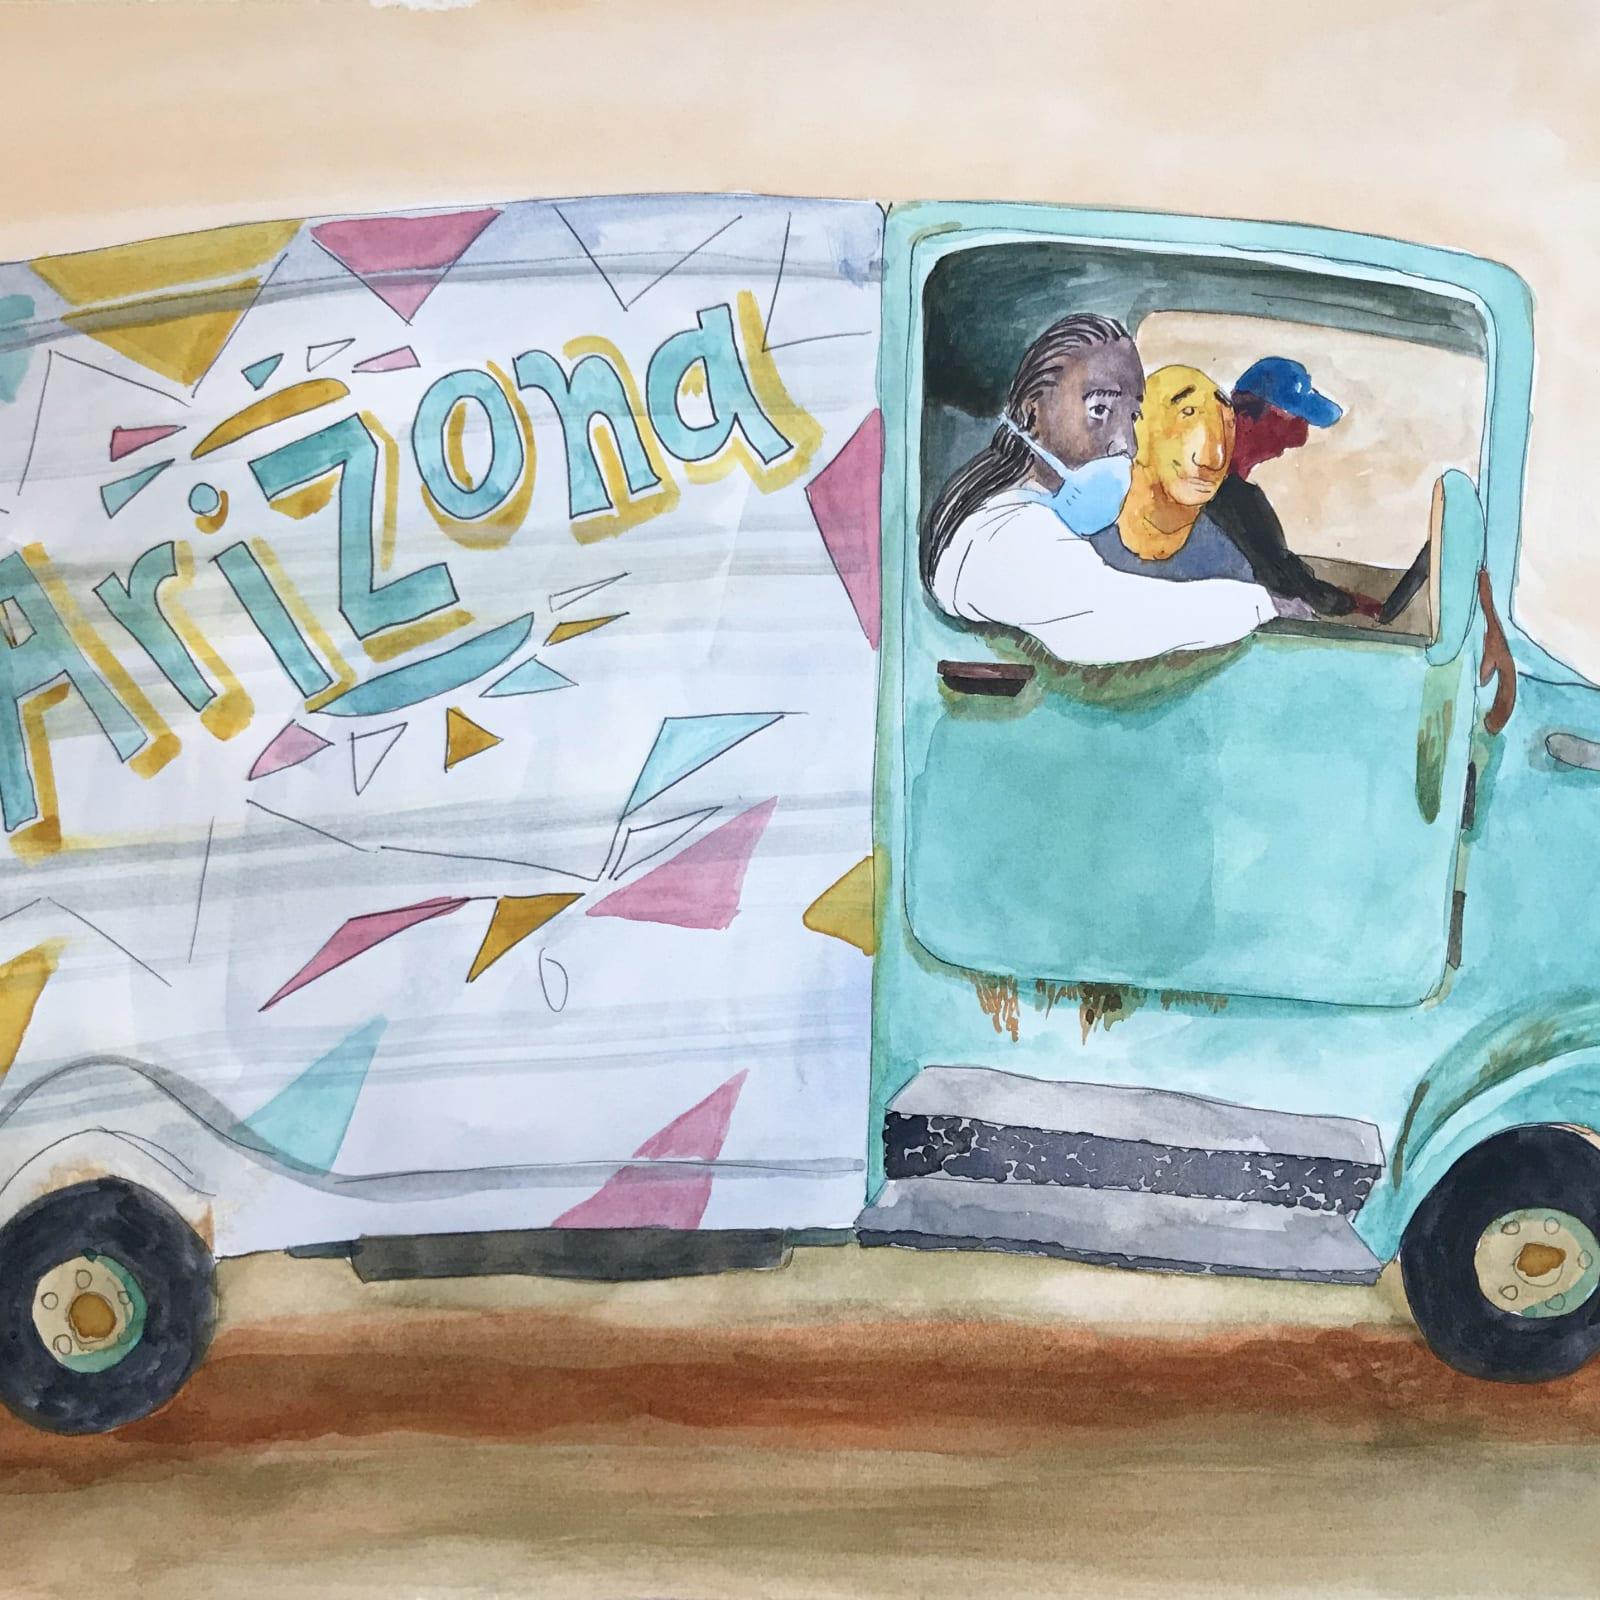 Maggie Ellis  Arizona Tea Truck, 2020  Watercolor on paper  10 x 14 in (25.4 x 35.6 cm)